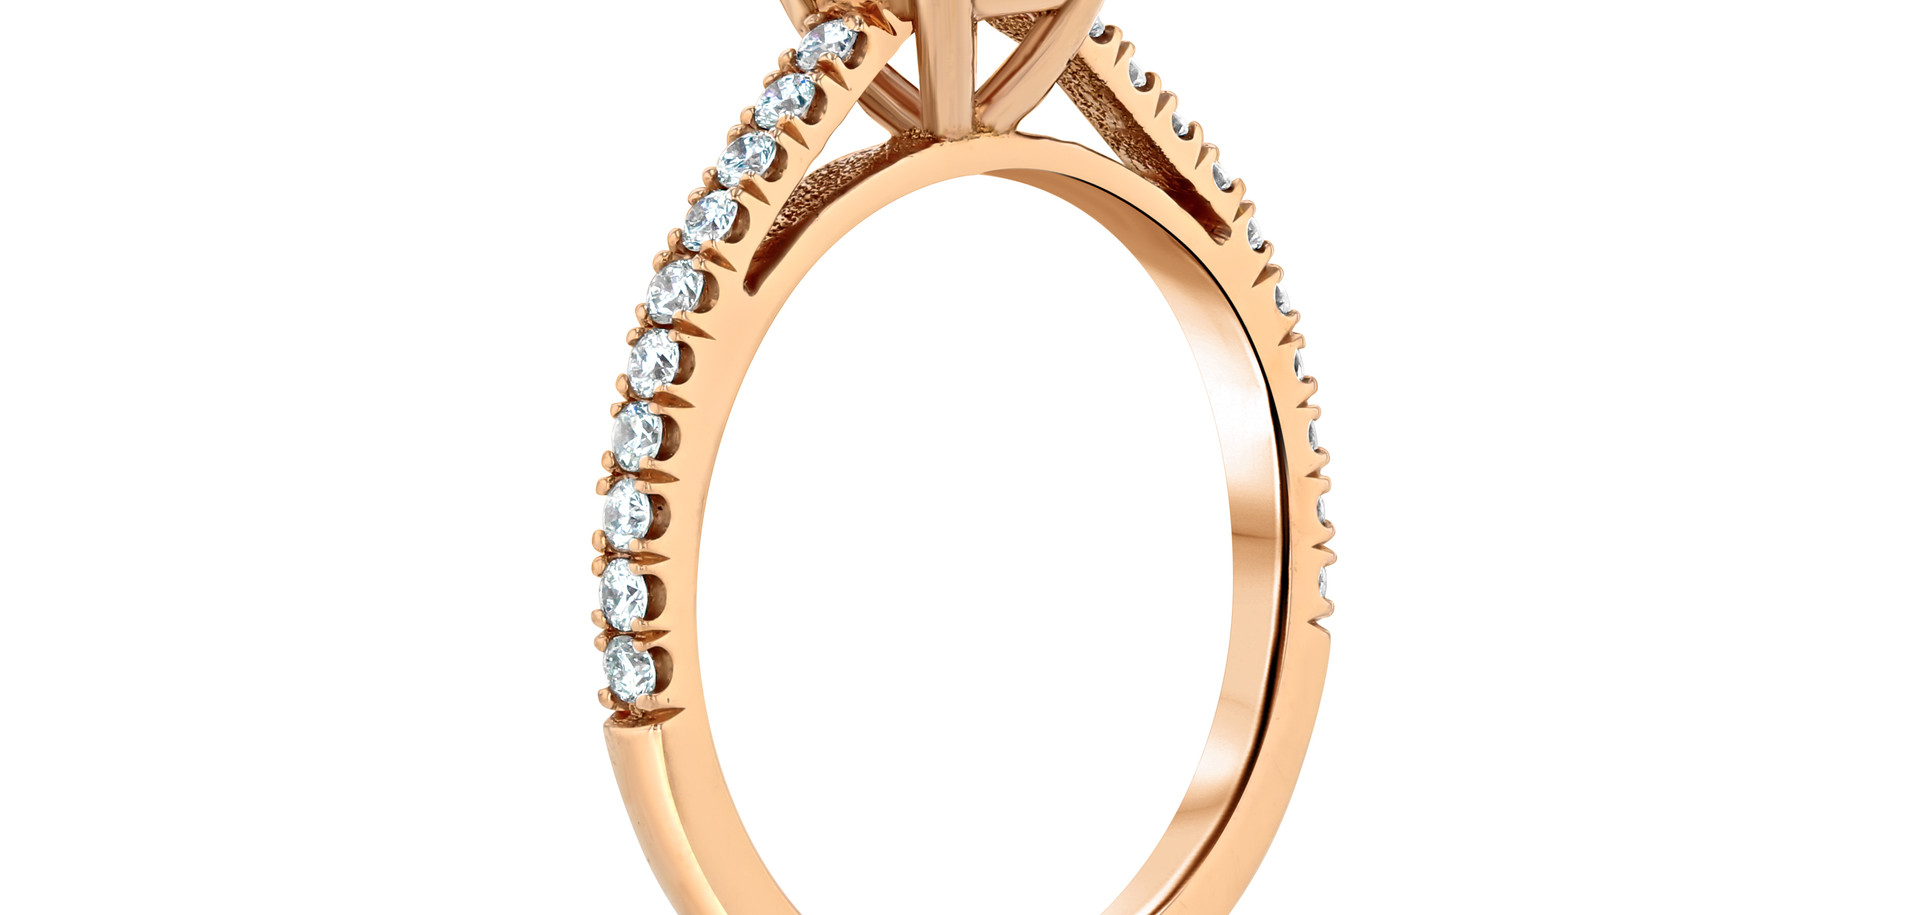 Copy of Engagement Ring 10_b0.JPG